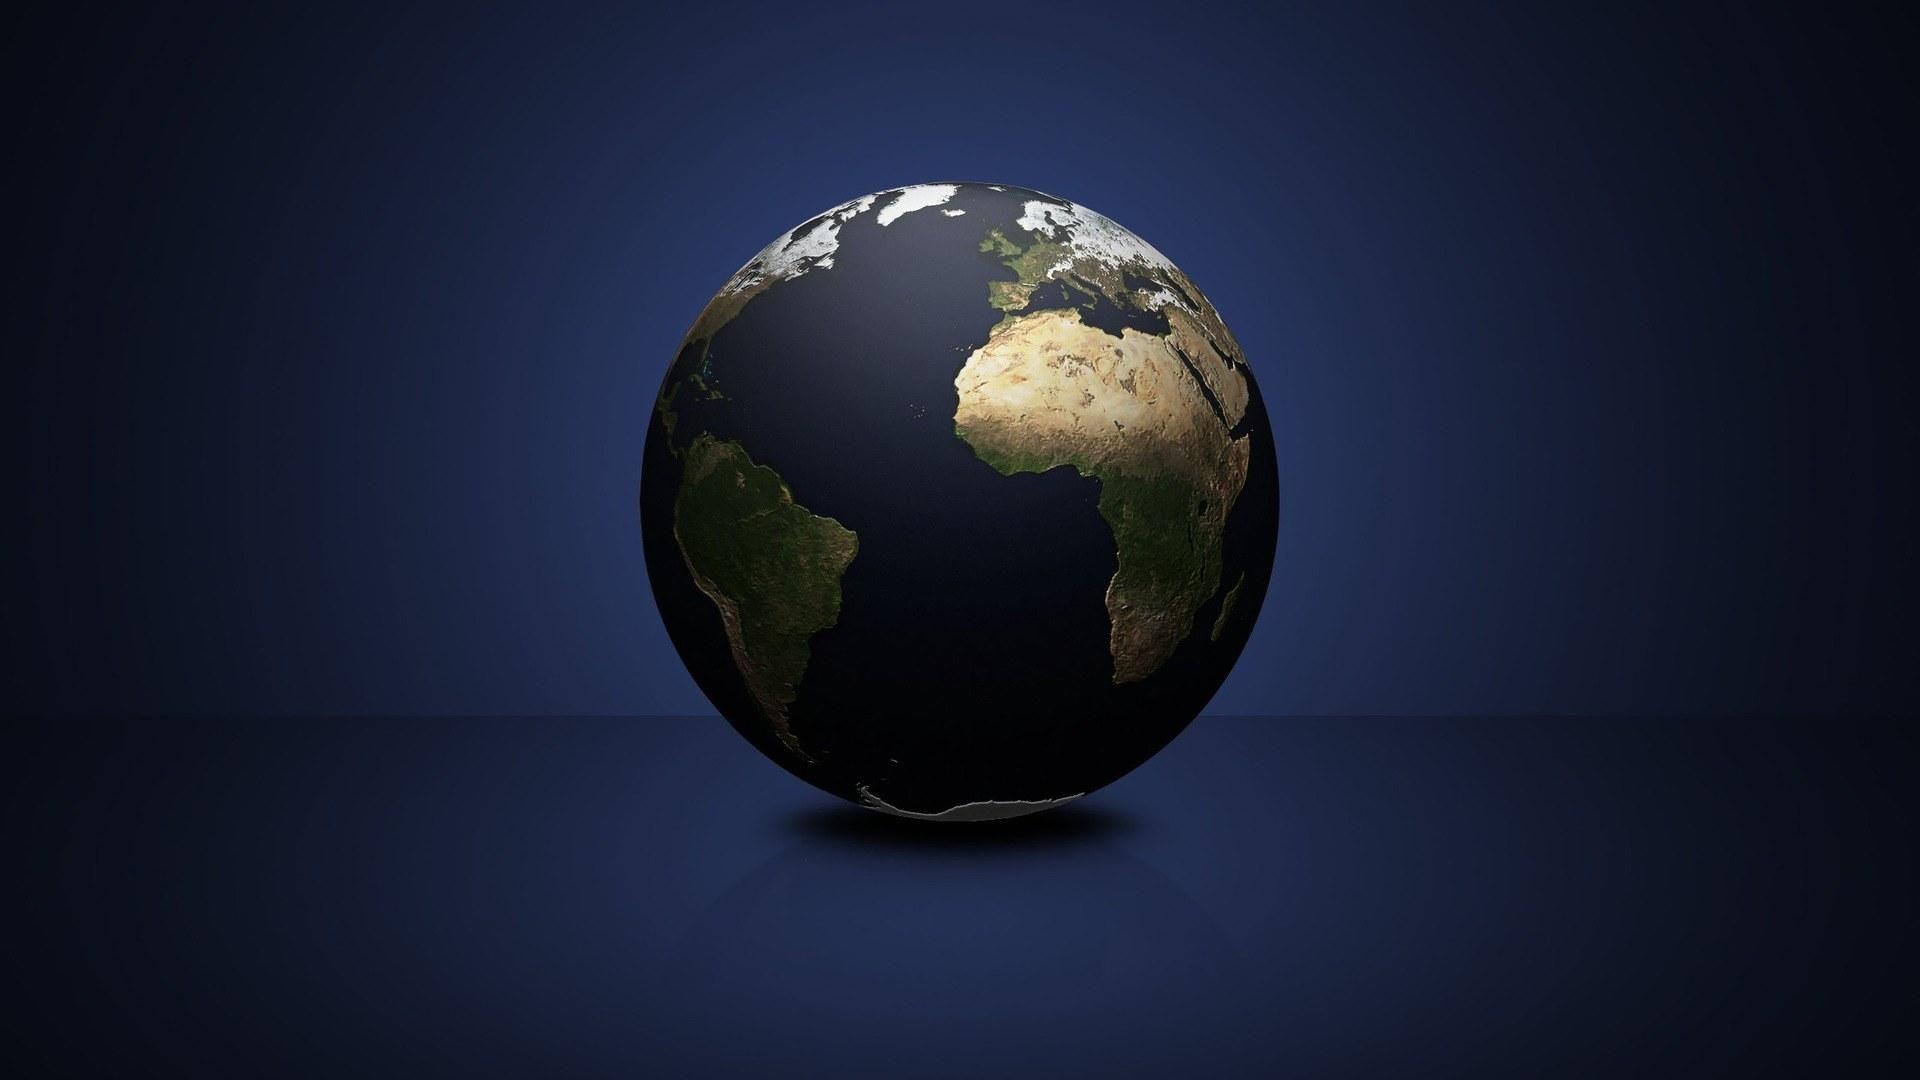 Earth free desktop background